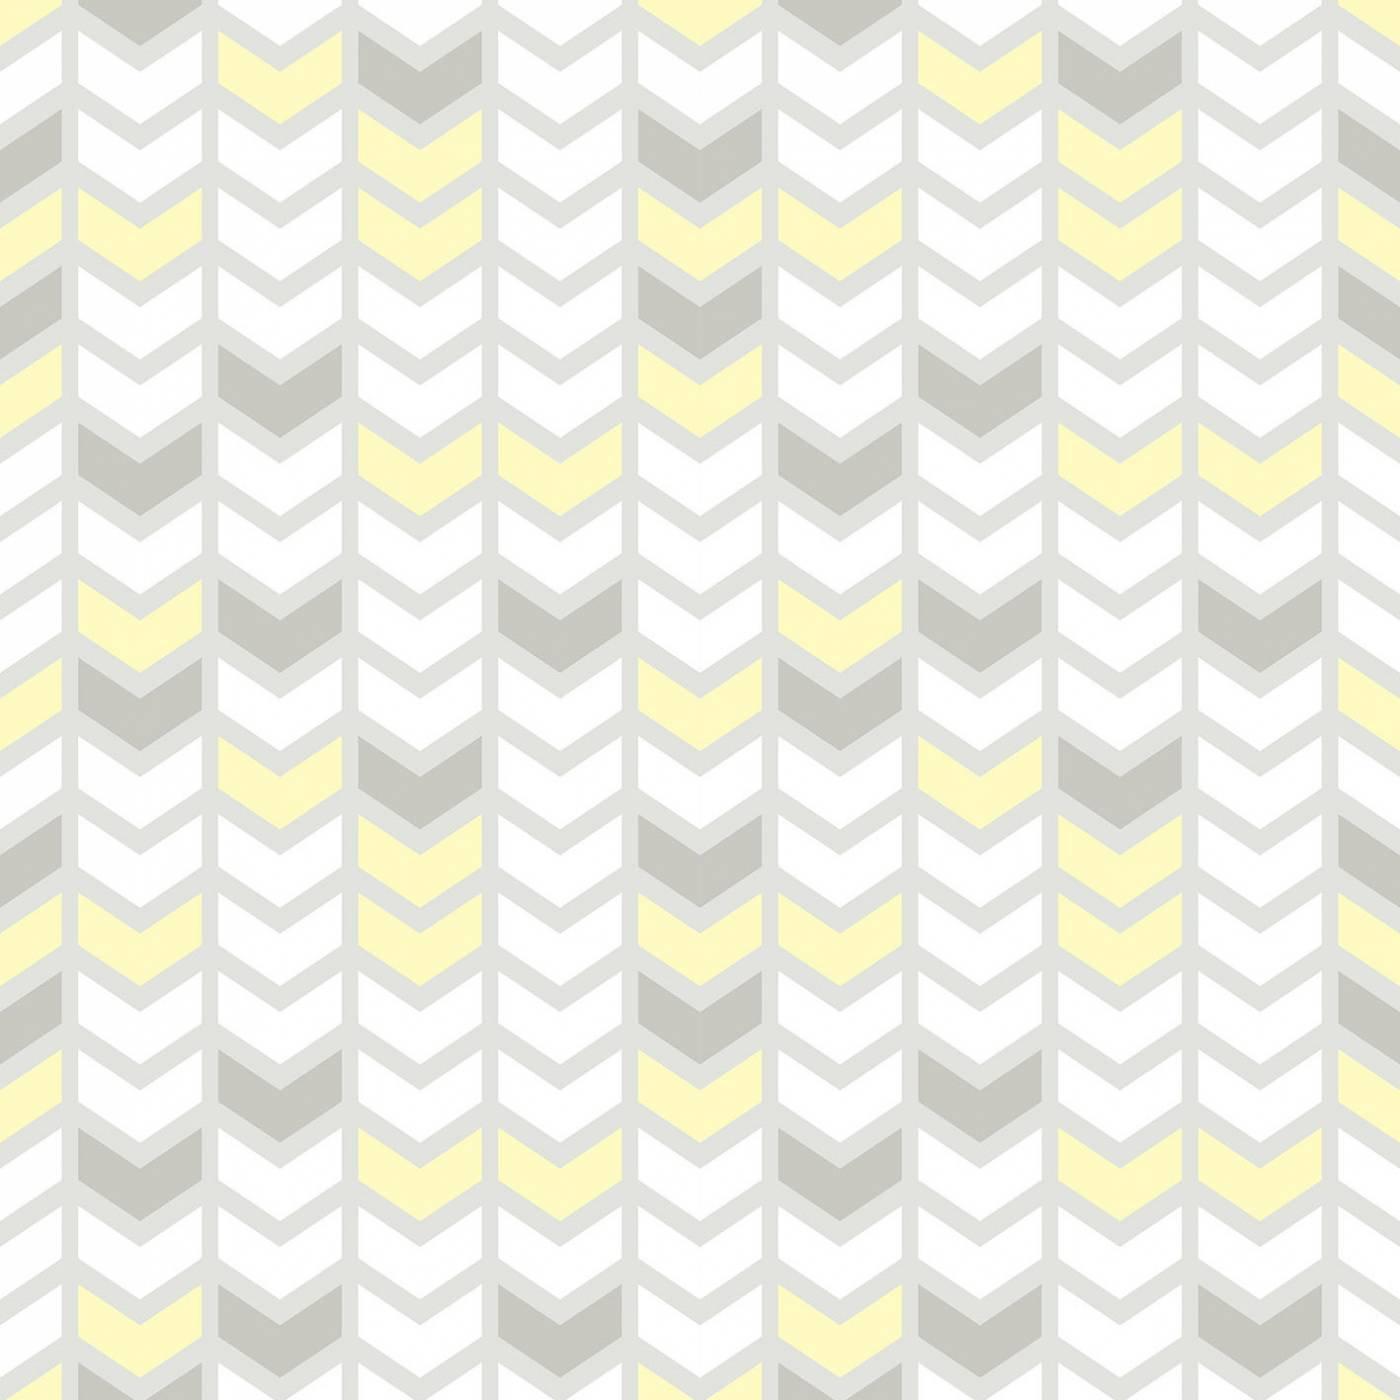 Papel de Parede Setas Amarelo e Cinza